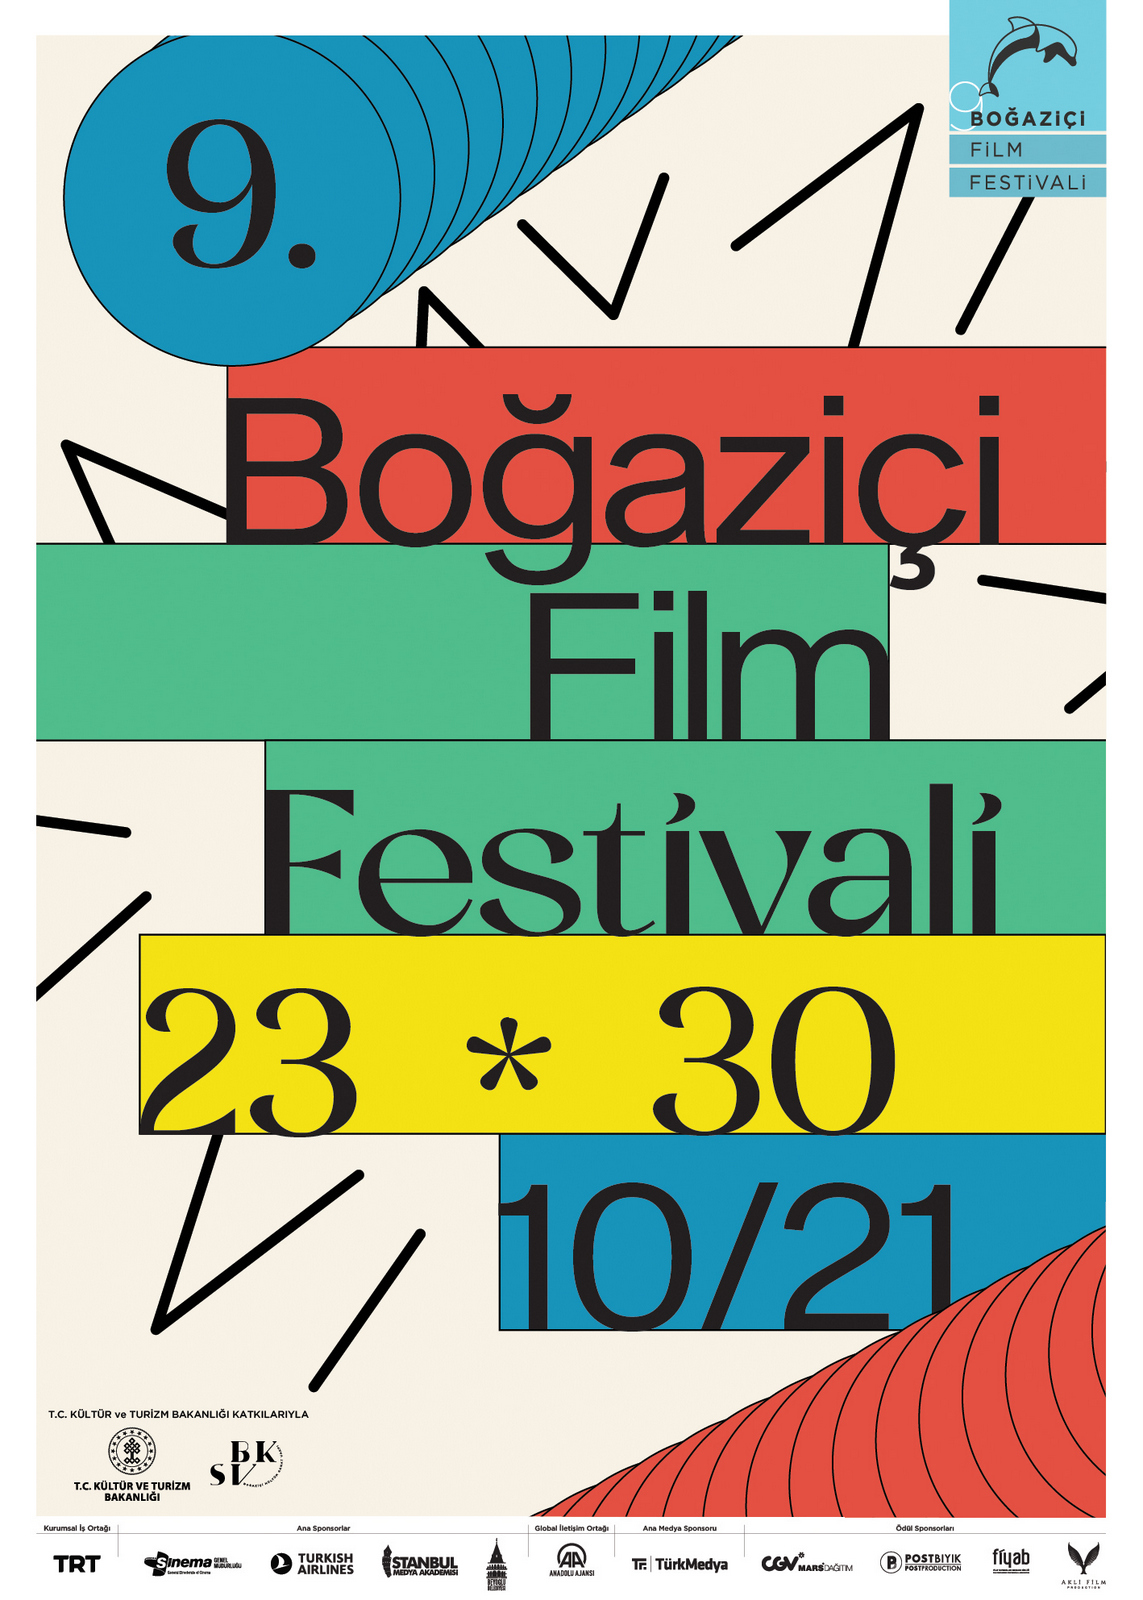 Boğaziçi Film Festivali (a).jpg